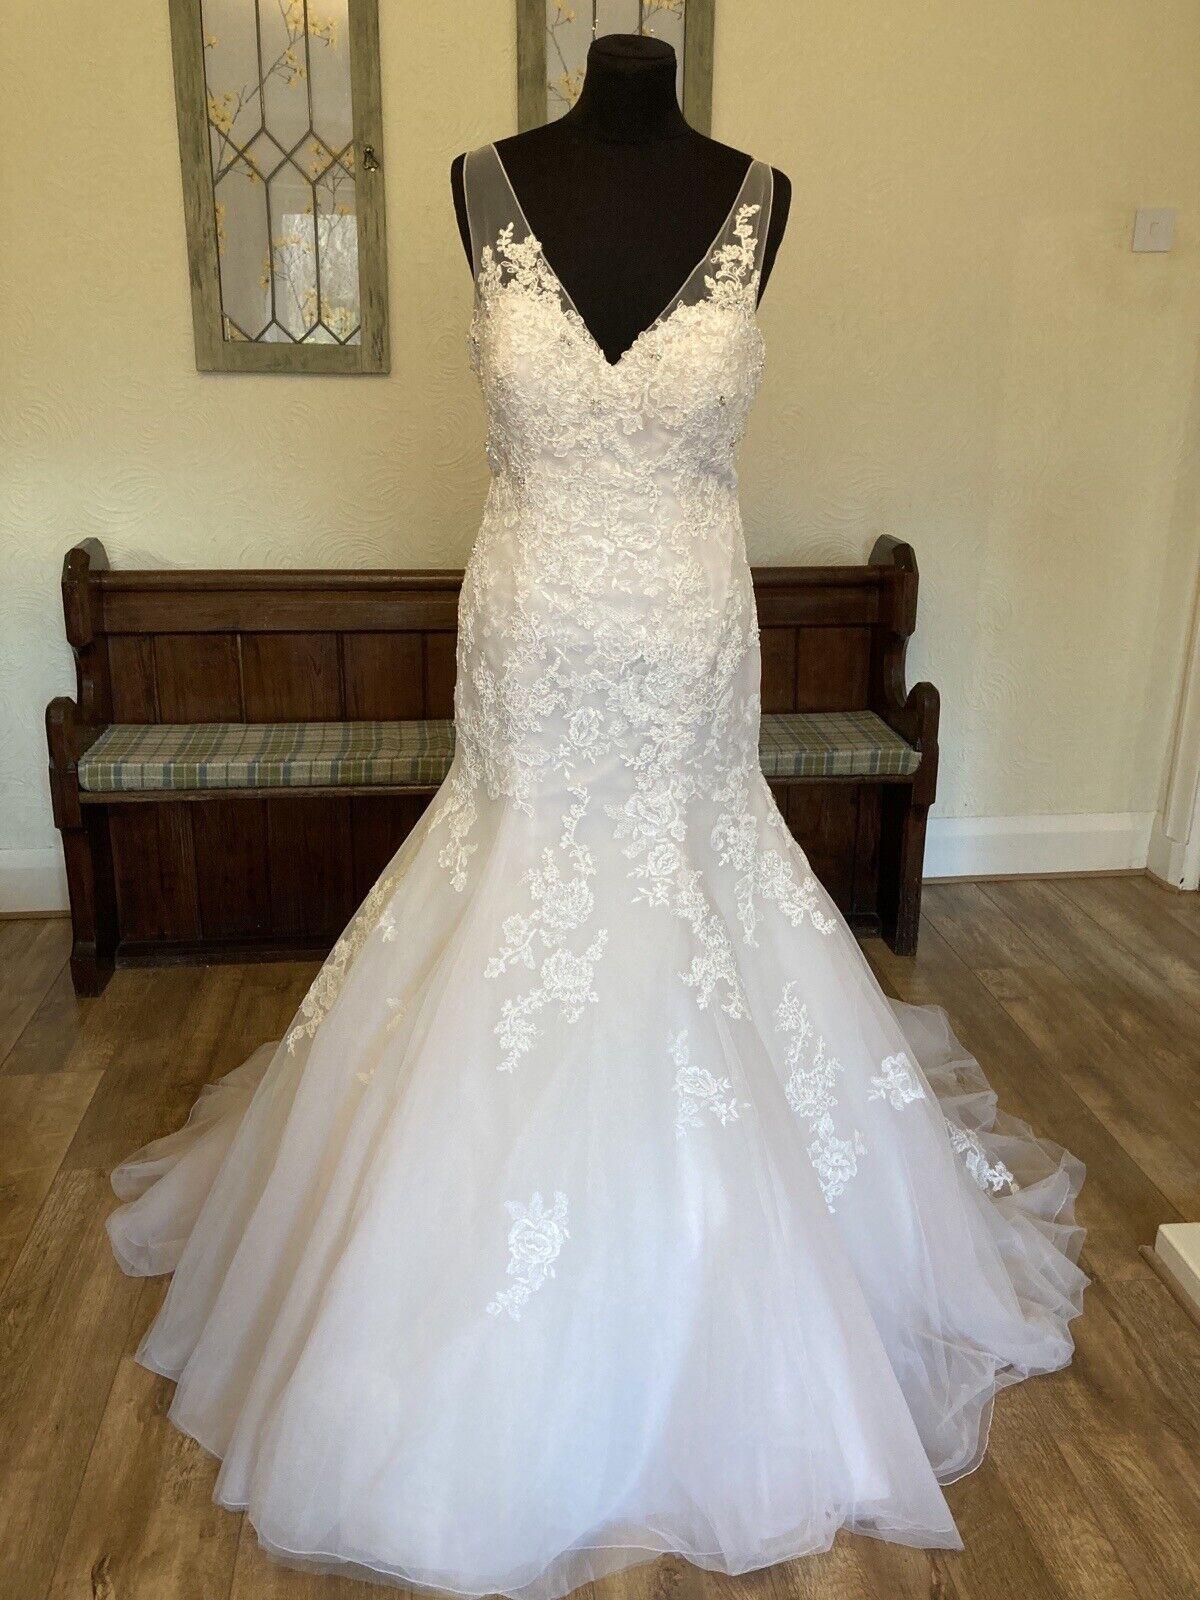 Ex Sample Ellis Bridal Blush Pink Fit Flare Lace Straps Wedding Dress Gown 14